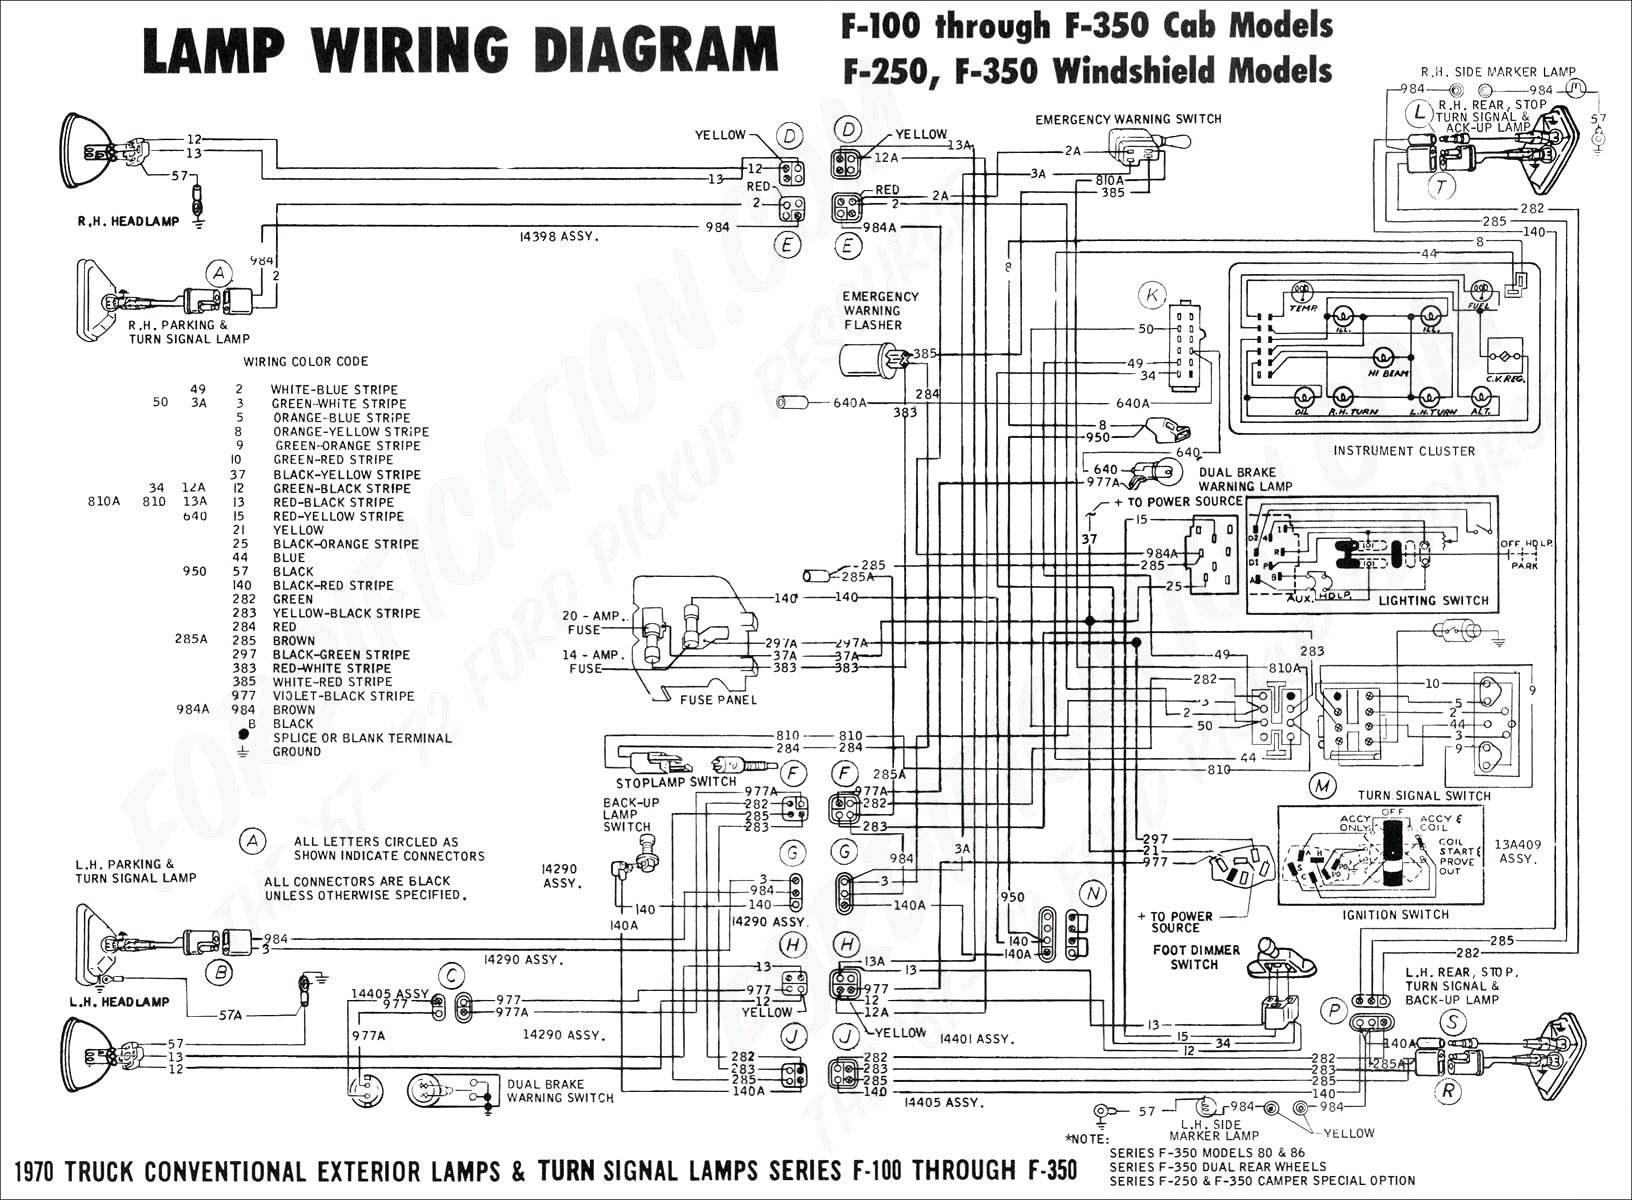 Power Window Diagram Wiring Diagram Power Window Archives Joescablecar Of Power Window Diagram